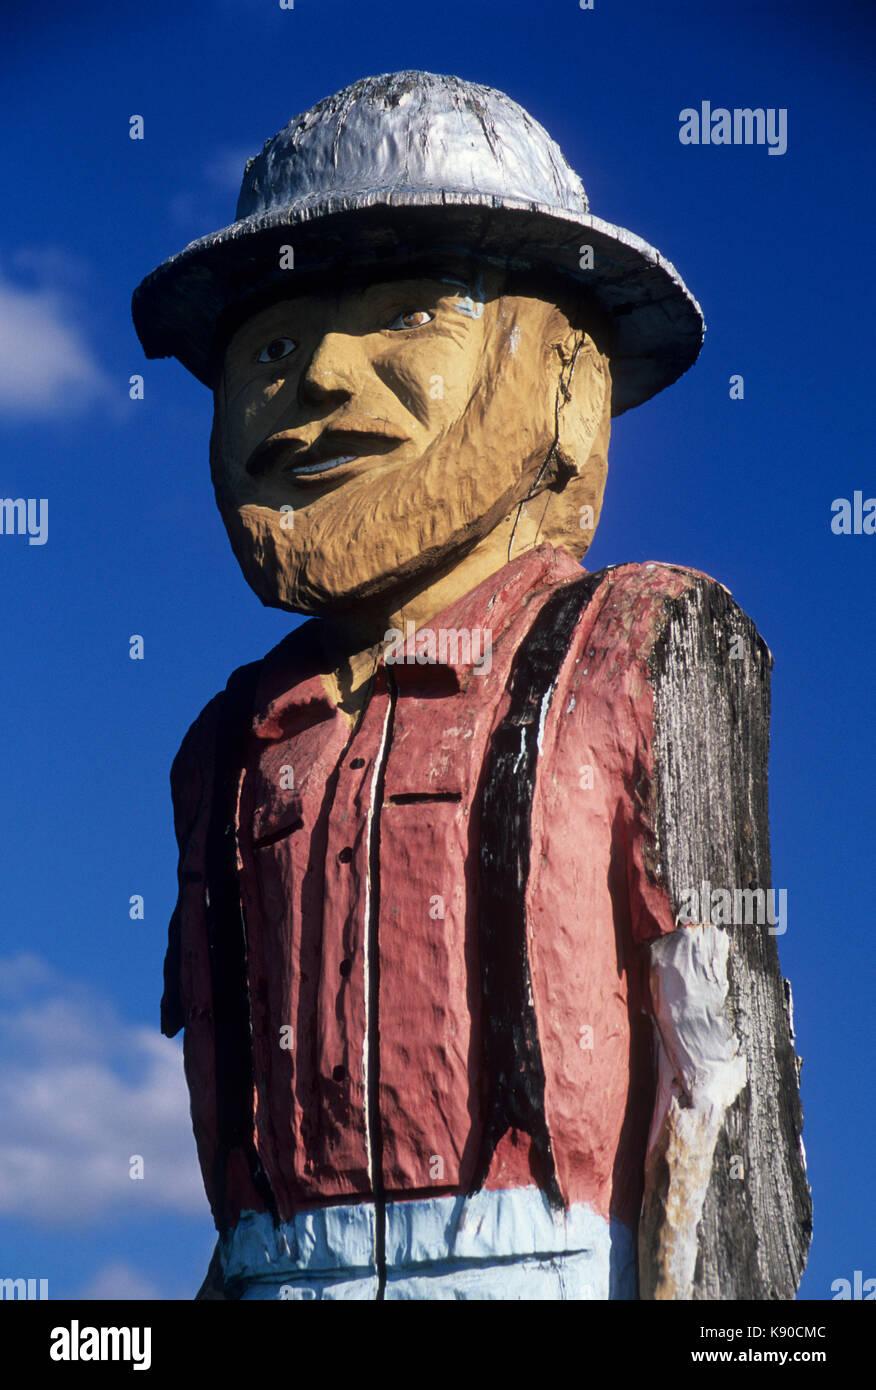 Chainsaw sculpture stock photos